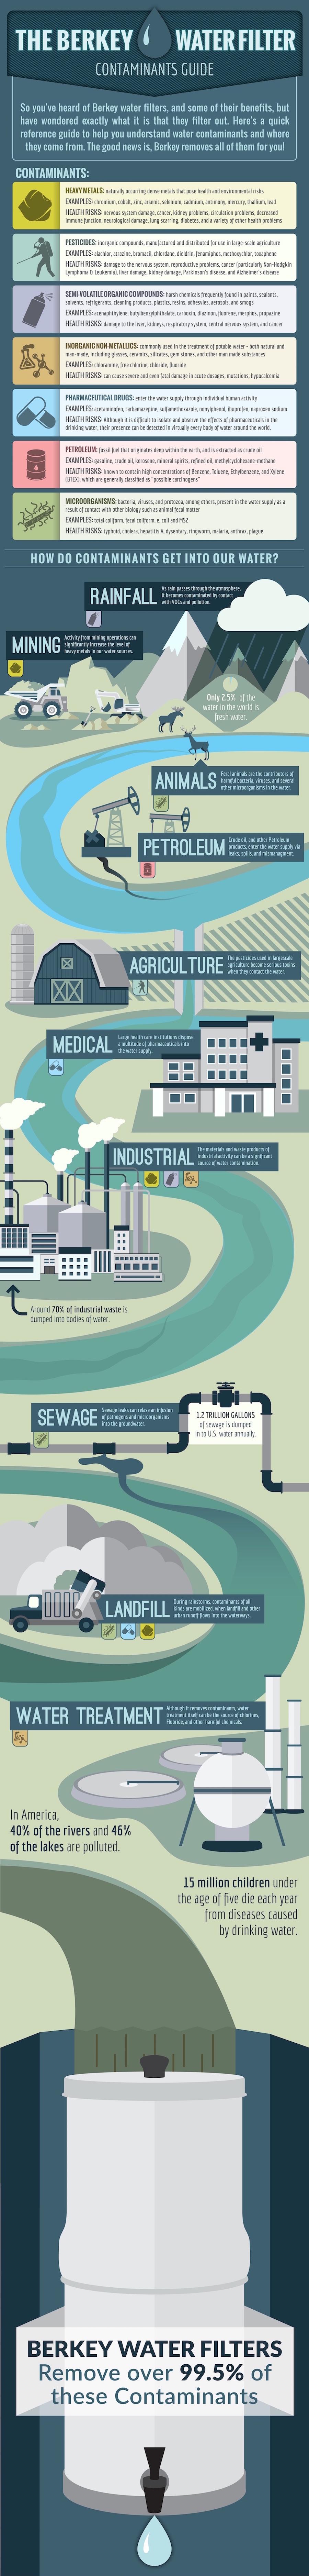 Berkey Water Filter Contaminants Guide